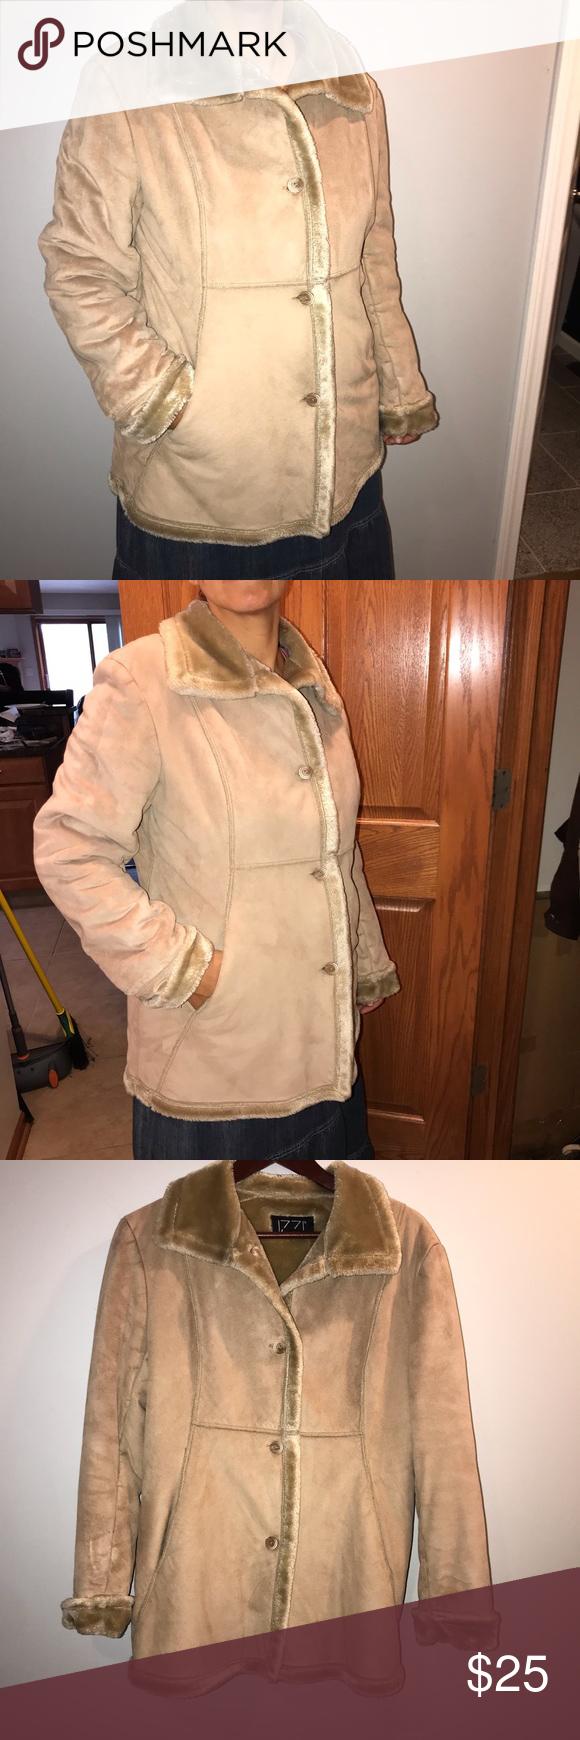 Izzi Coat Size Medium Izzi Coat Size Medium Izzi Jackets Coats Pea Coats Coat Jackets Coats Women Shopping [ 1740 x 580 Pixel ]